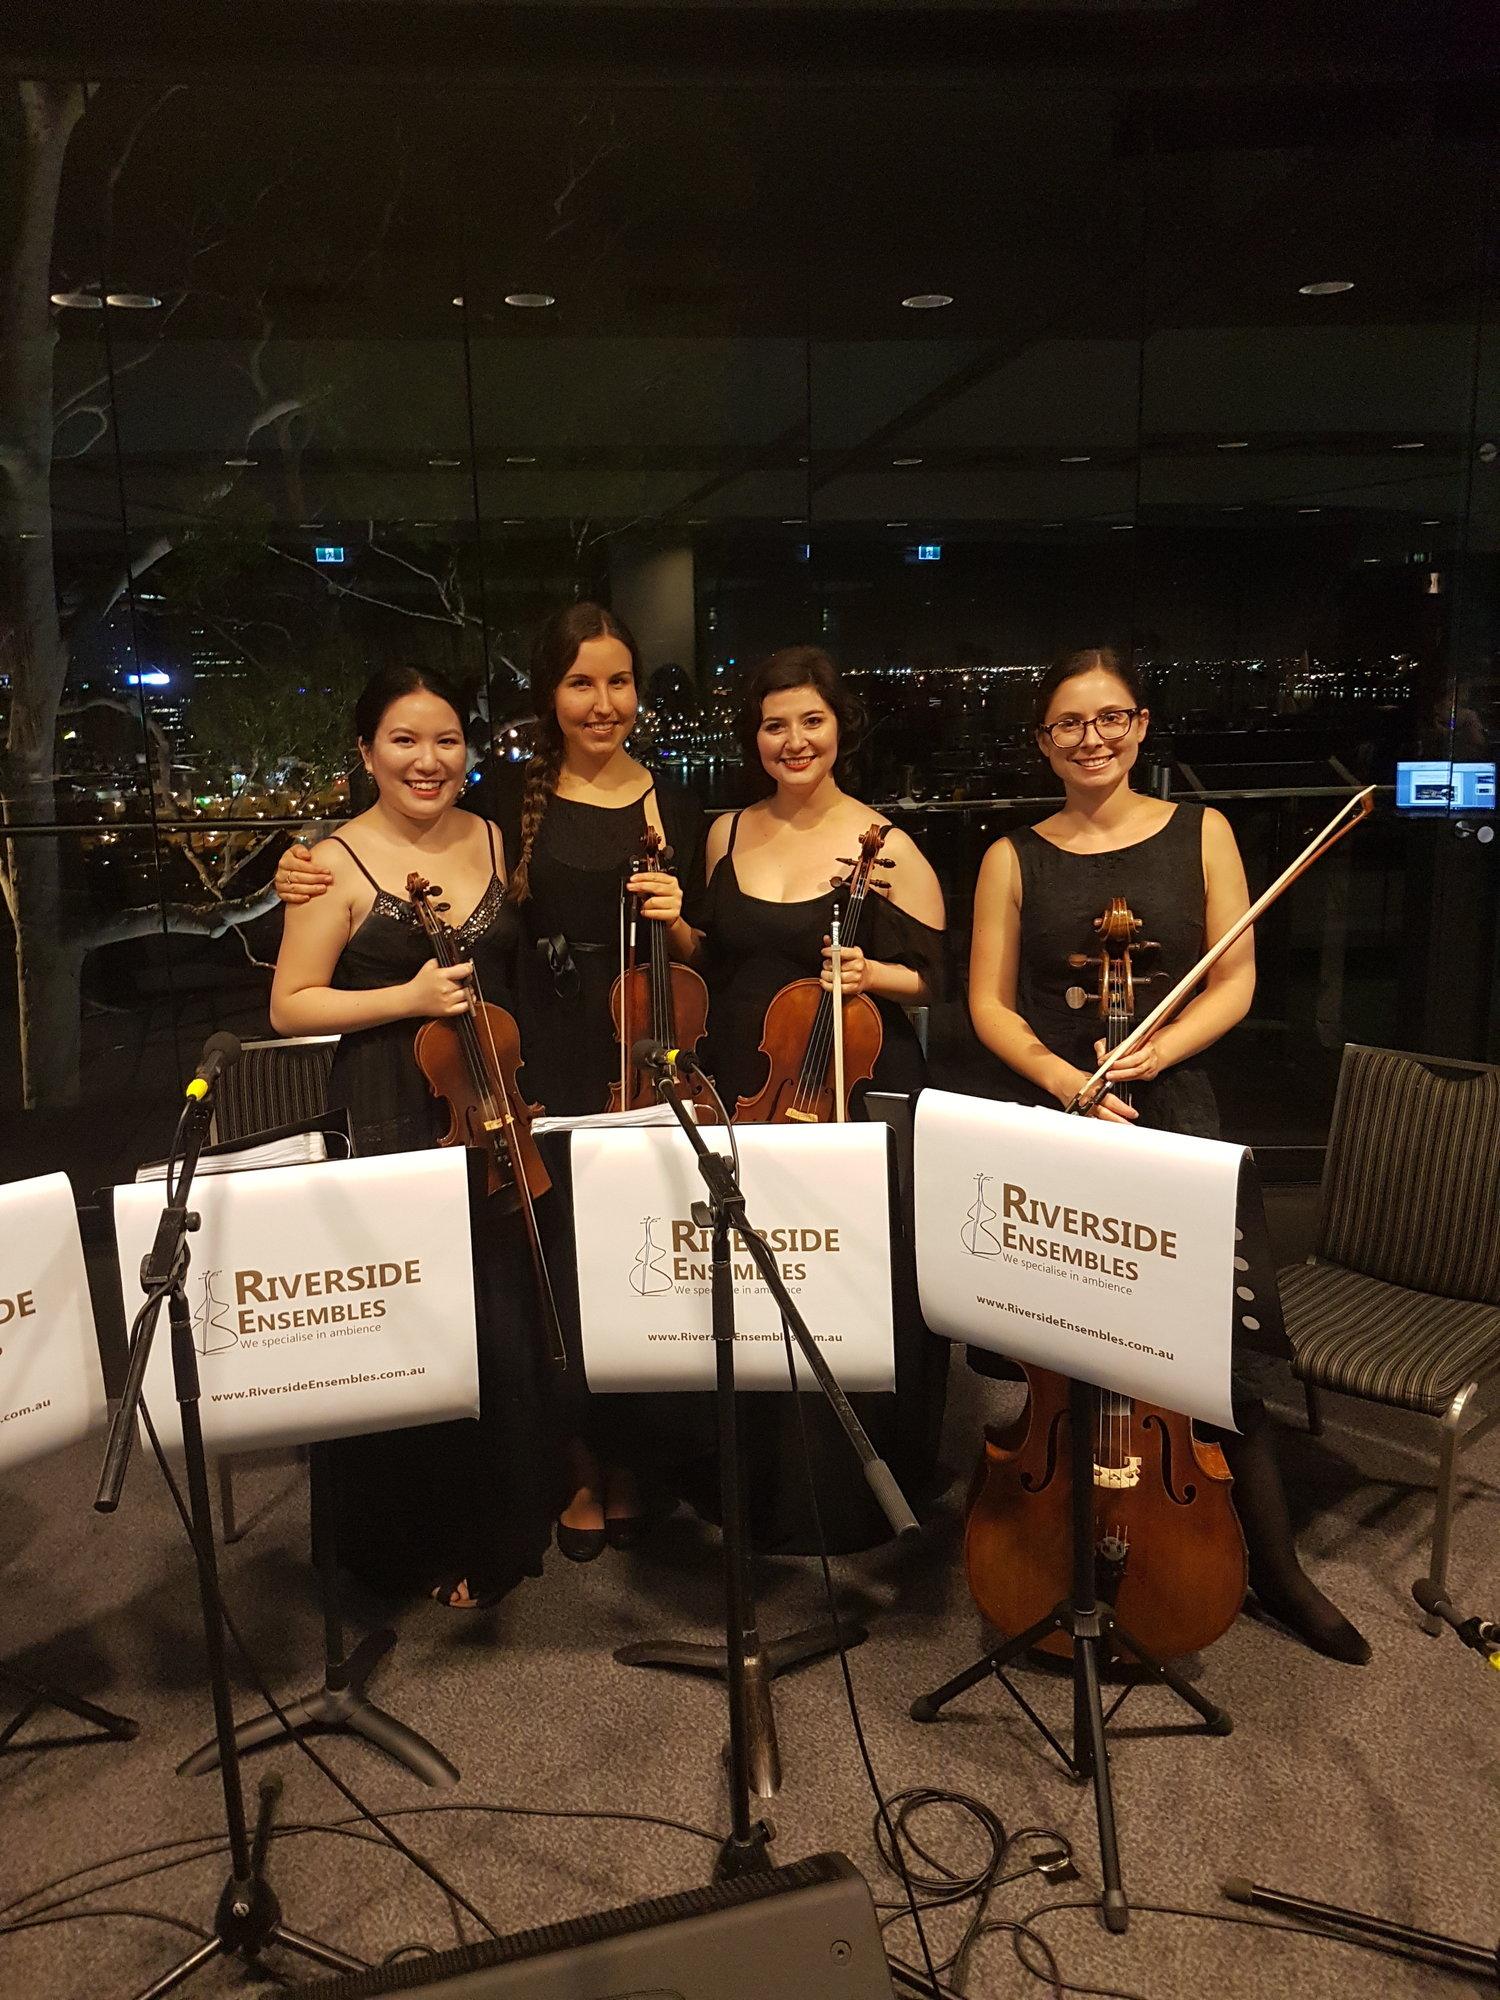 perth-function-string-music-hire-wedding-riverside-musiciansperth-function-string-music-hire-wedding-riverside-musicians-classical-contemporary-quartet-viola-violinists-cellist-violin